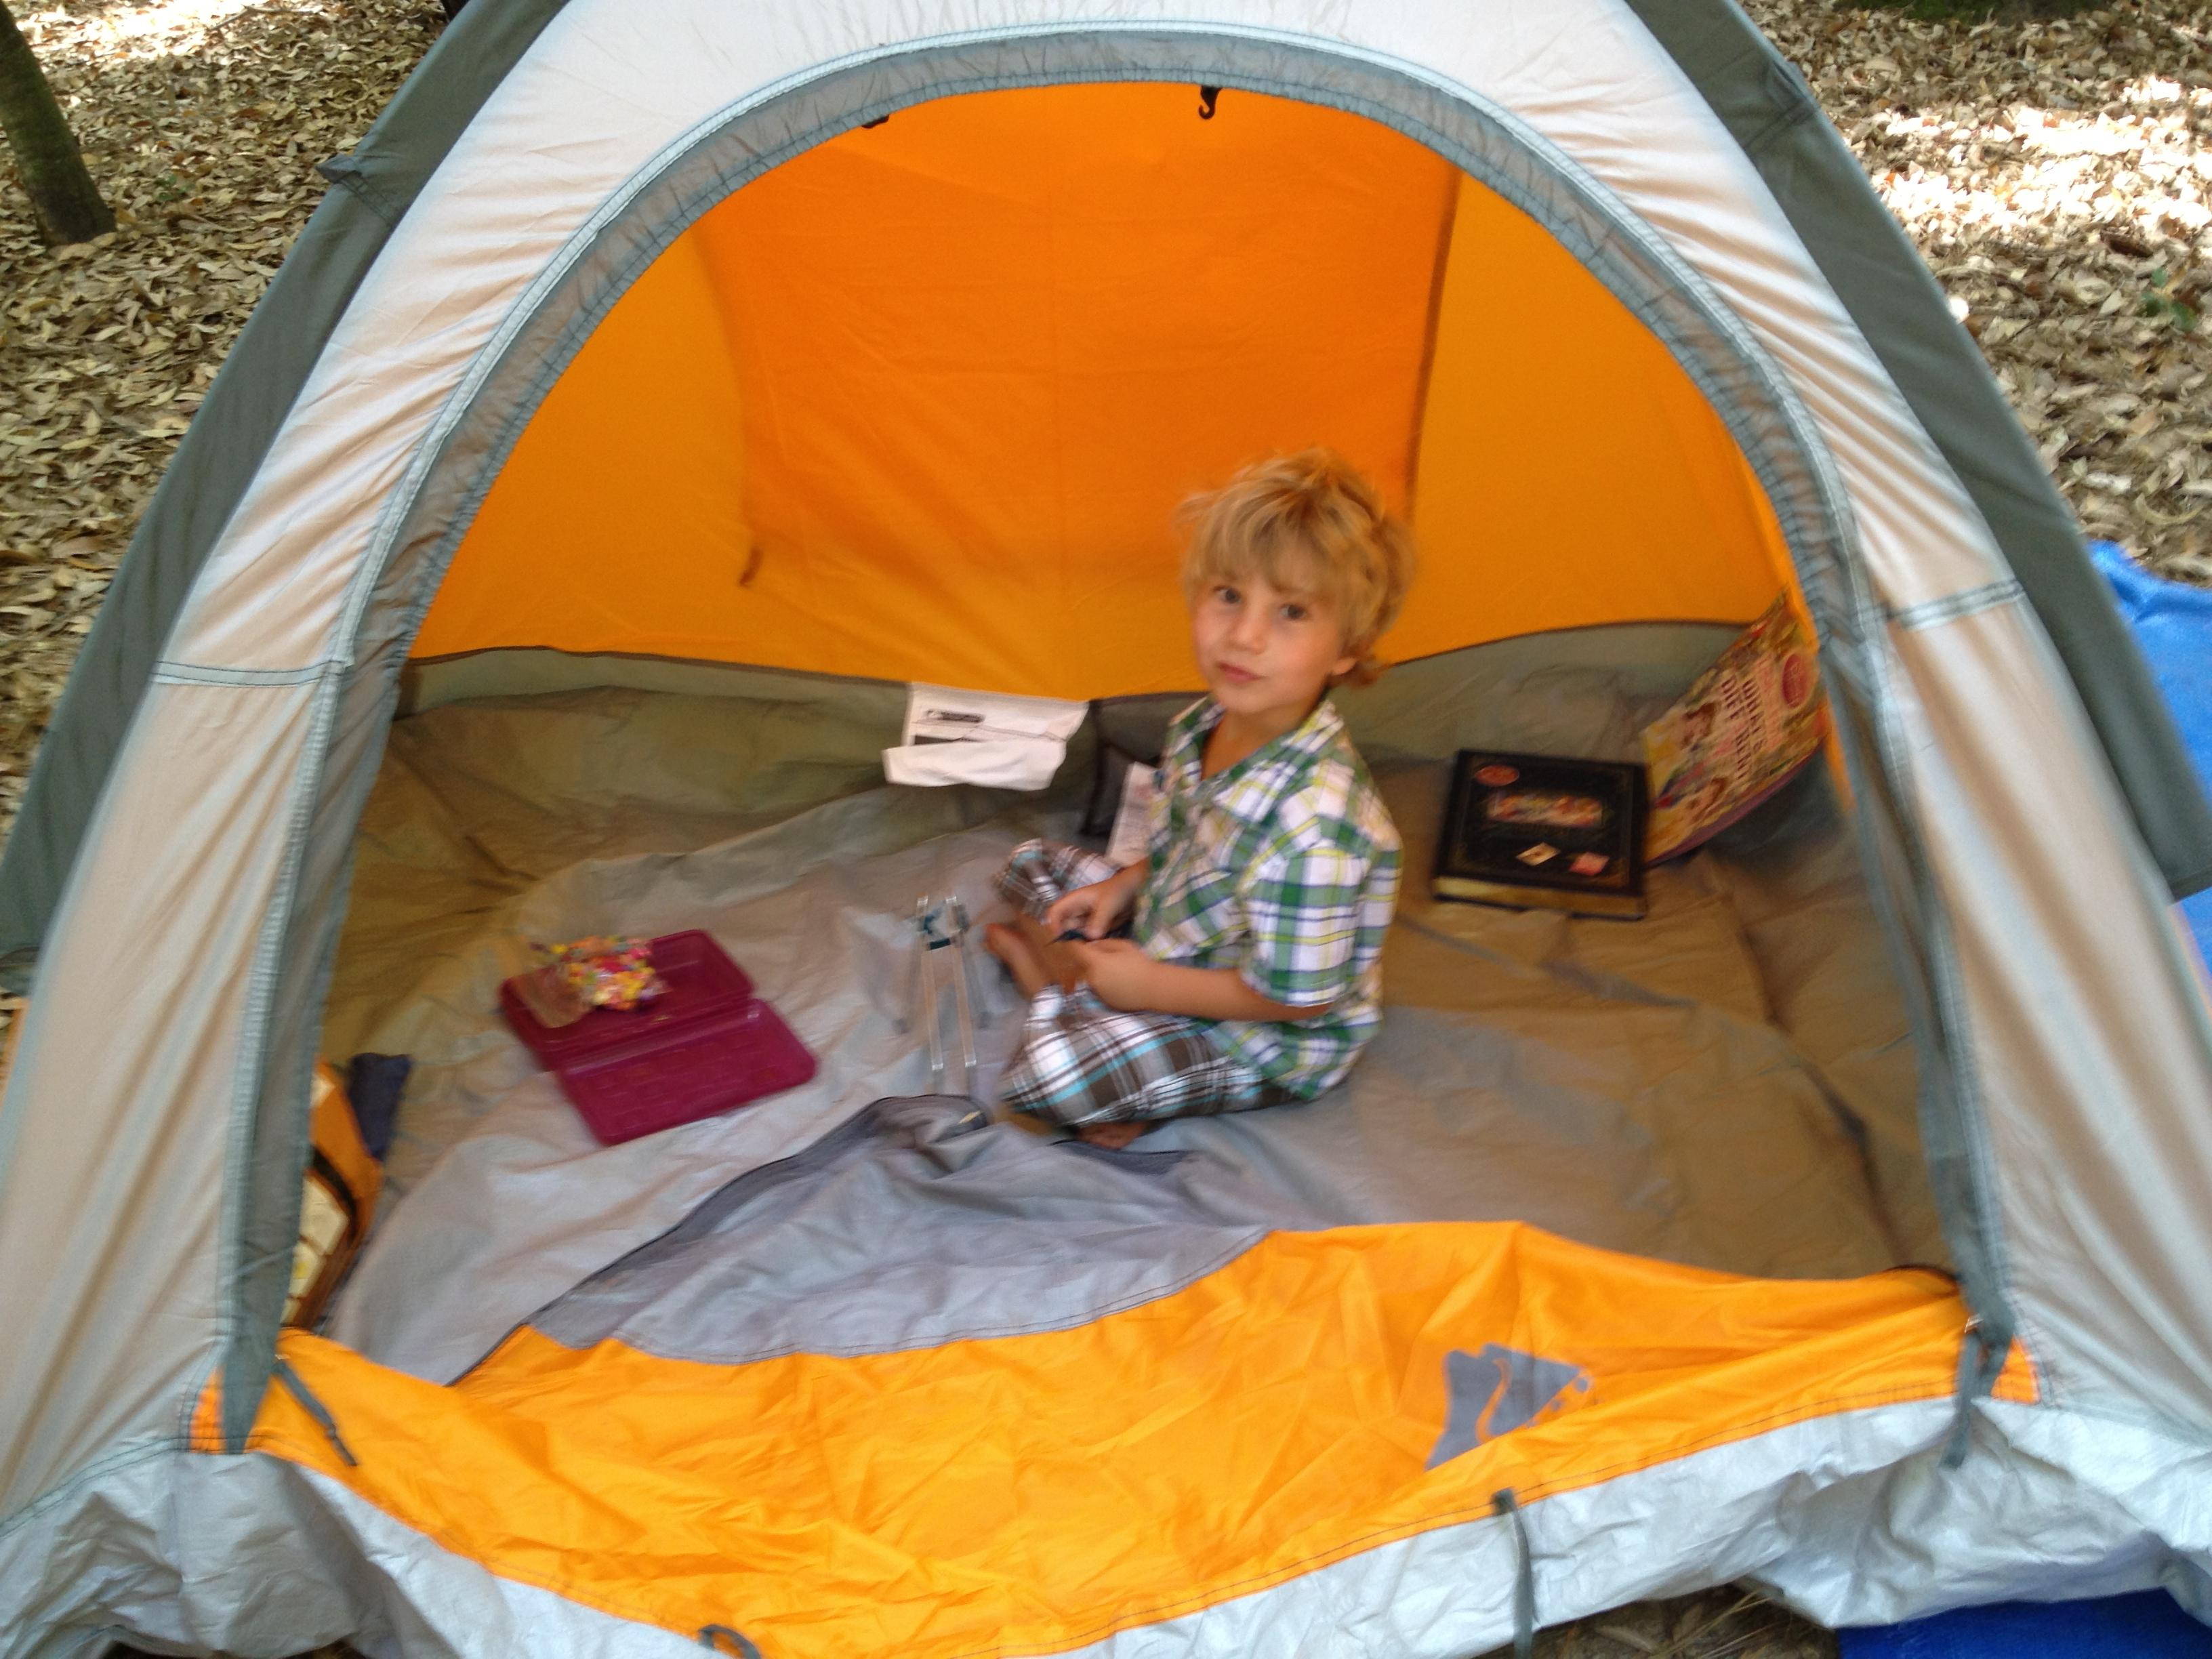 Top 5 Family Camping Destinations And Tips Near Sacramento